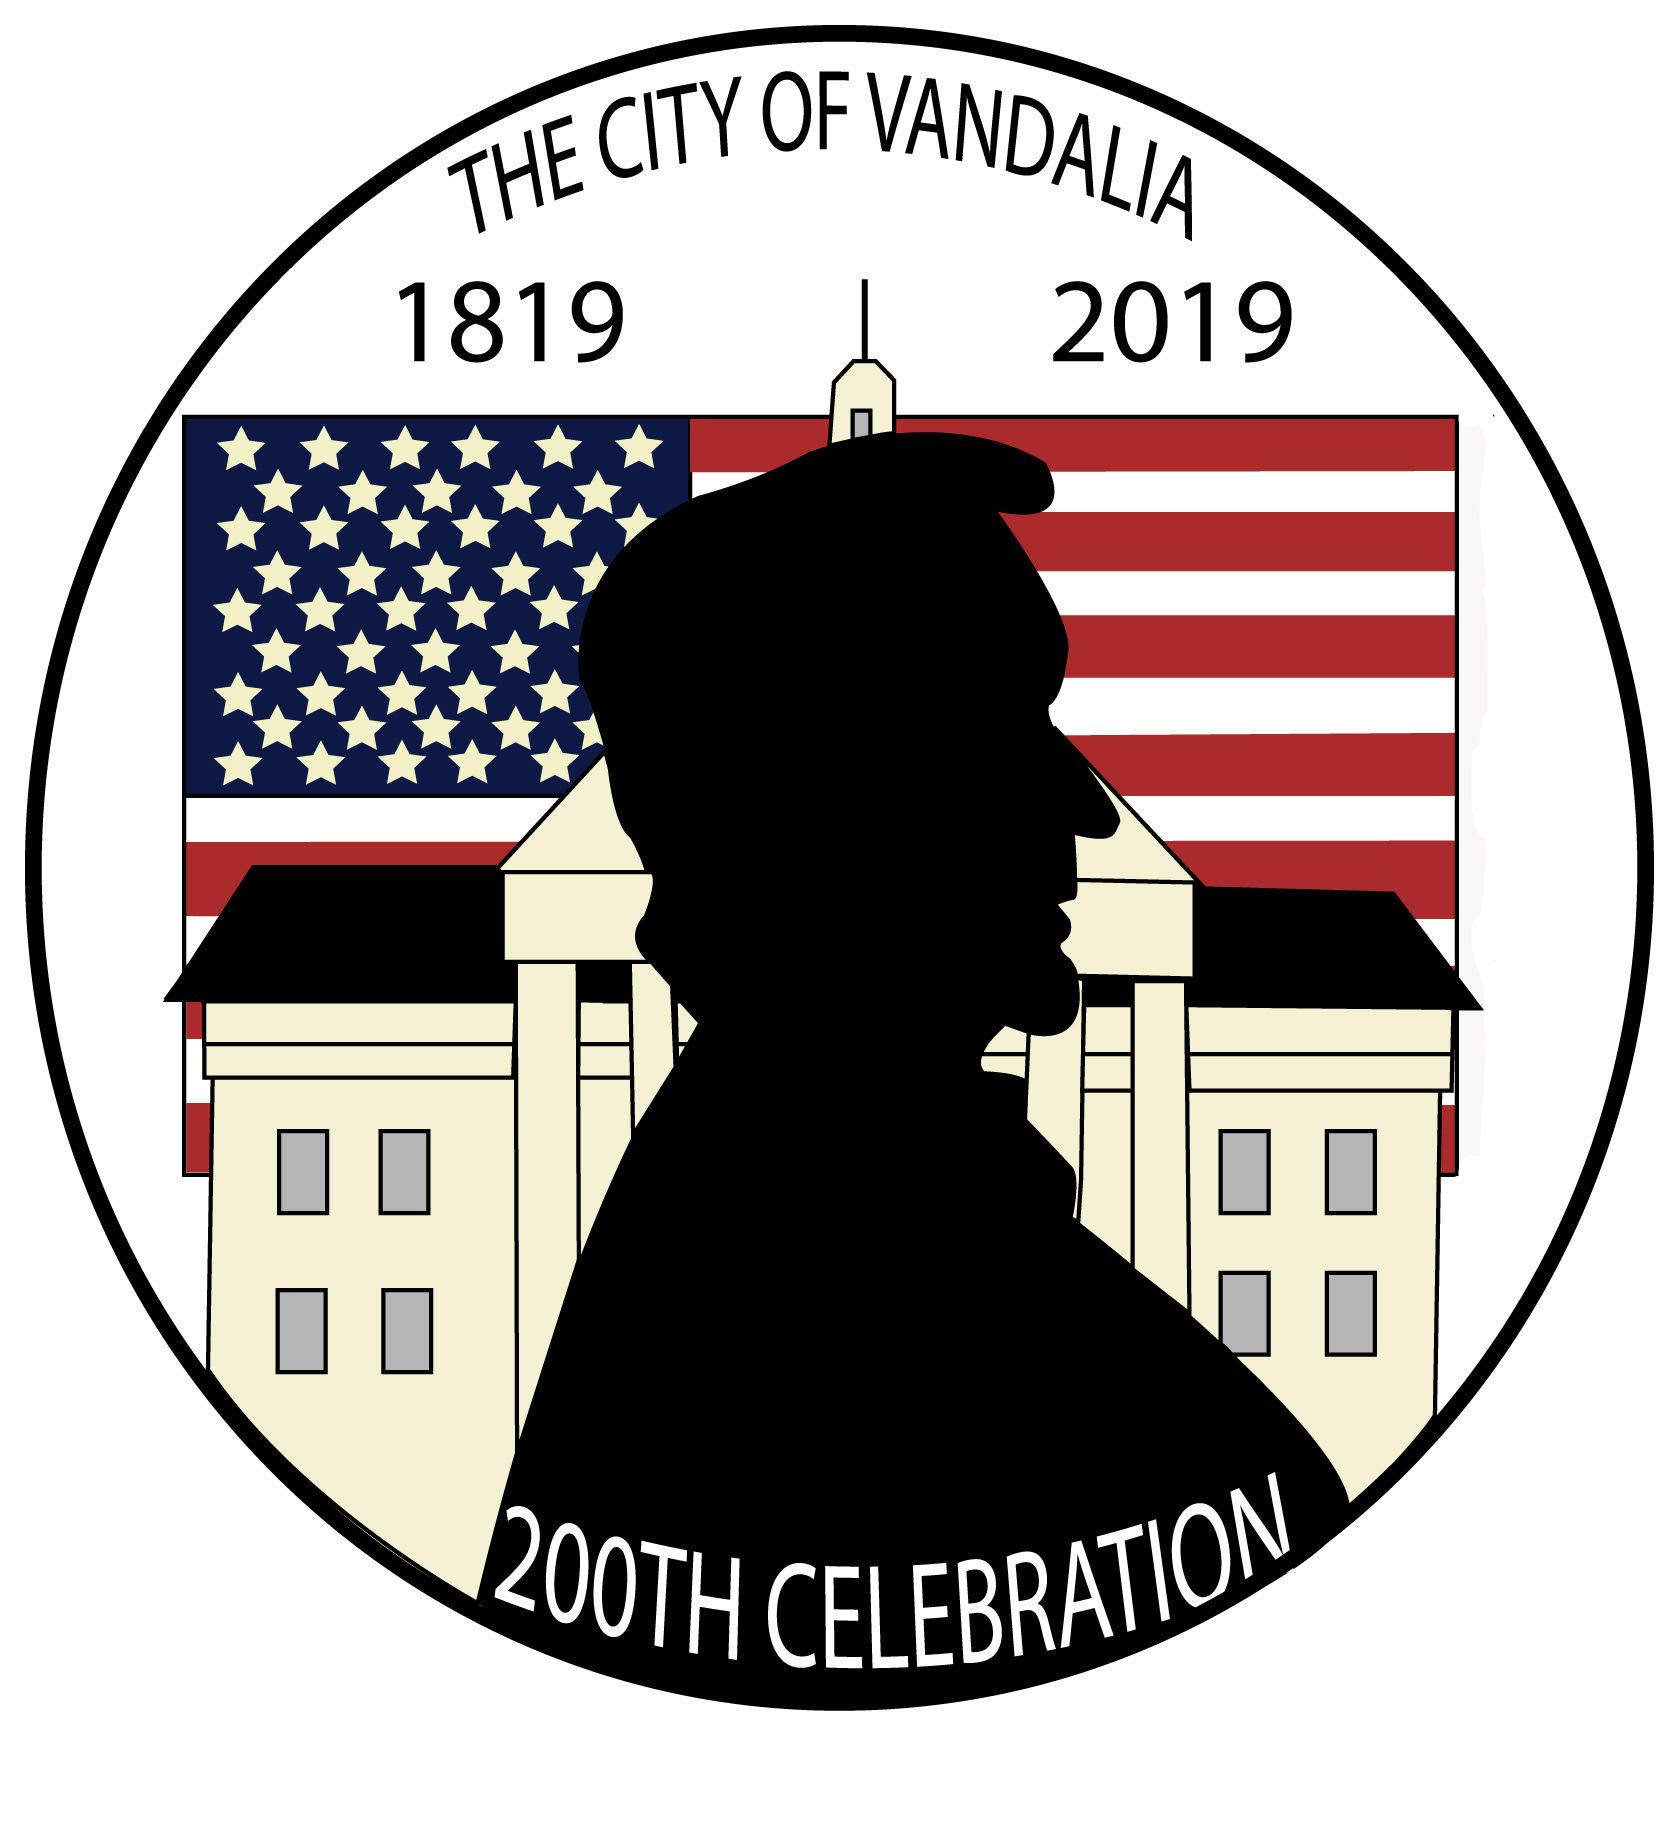 Vandalia Bicentennial Brothers of the Brush Contest Kicks Off Sunday